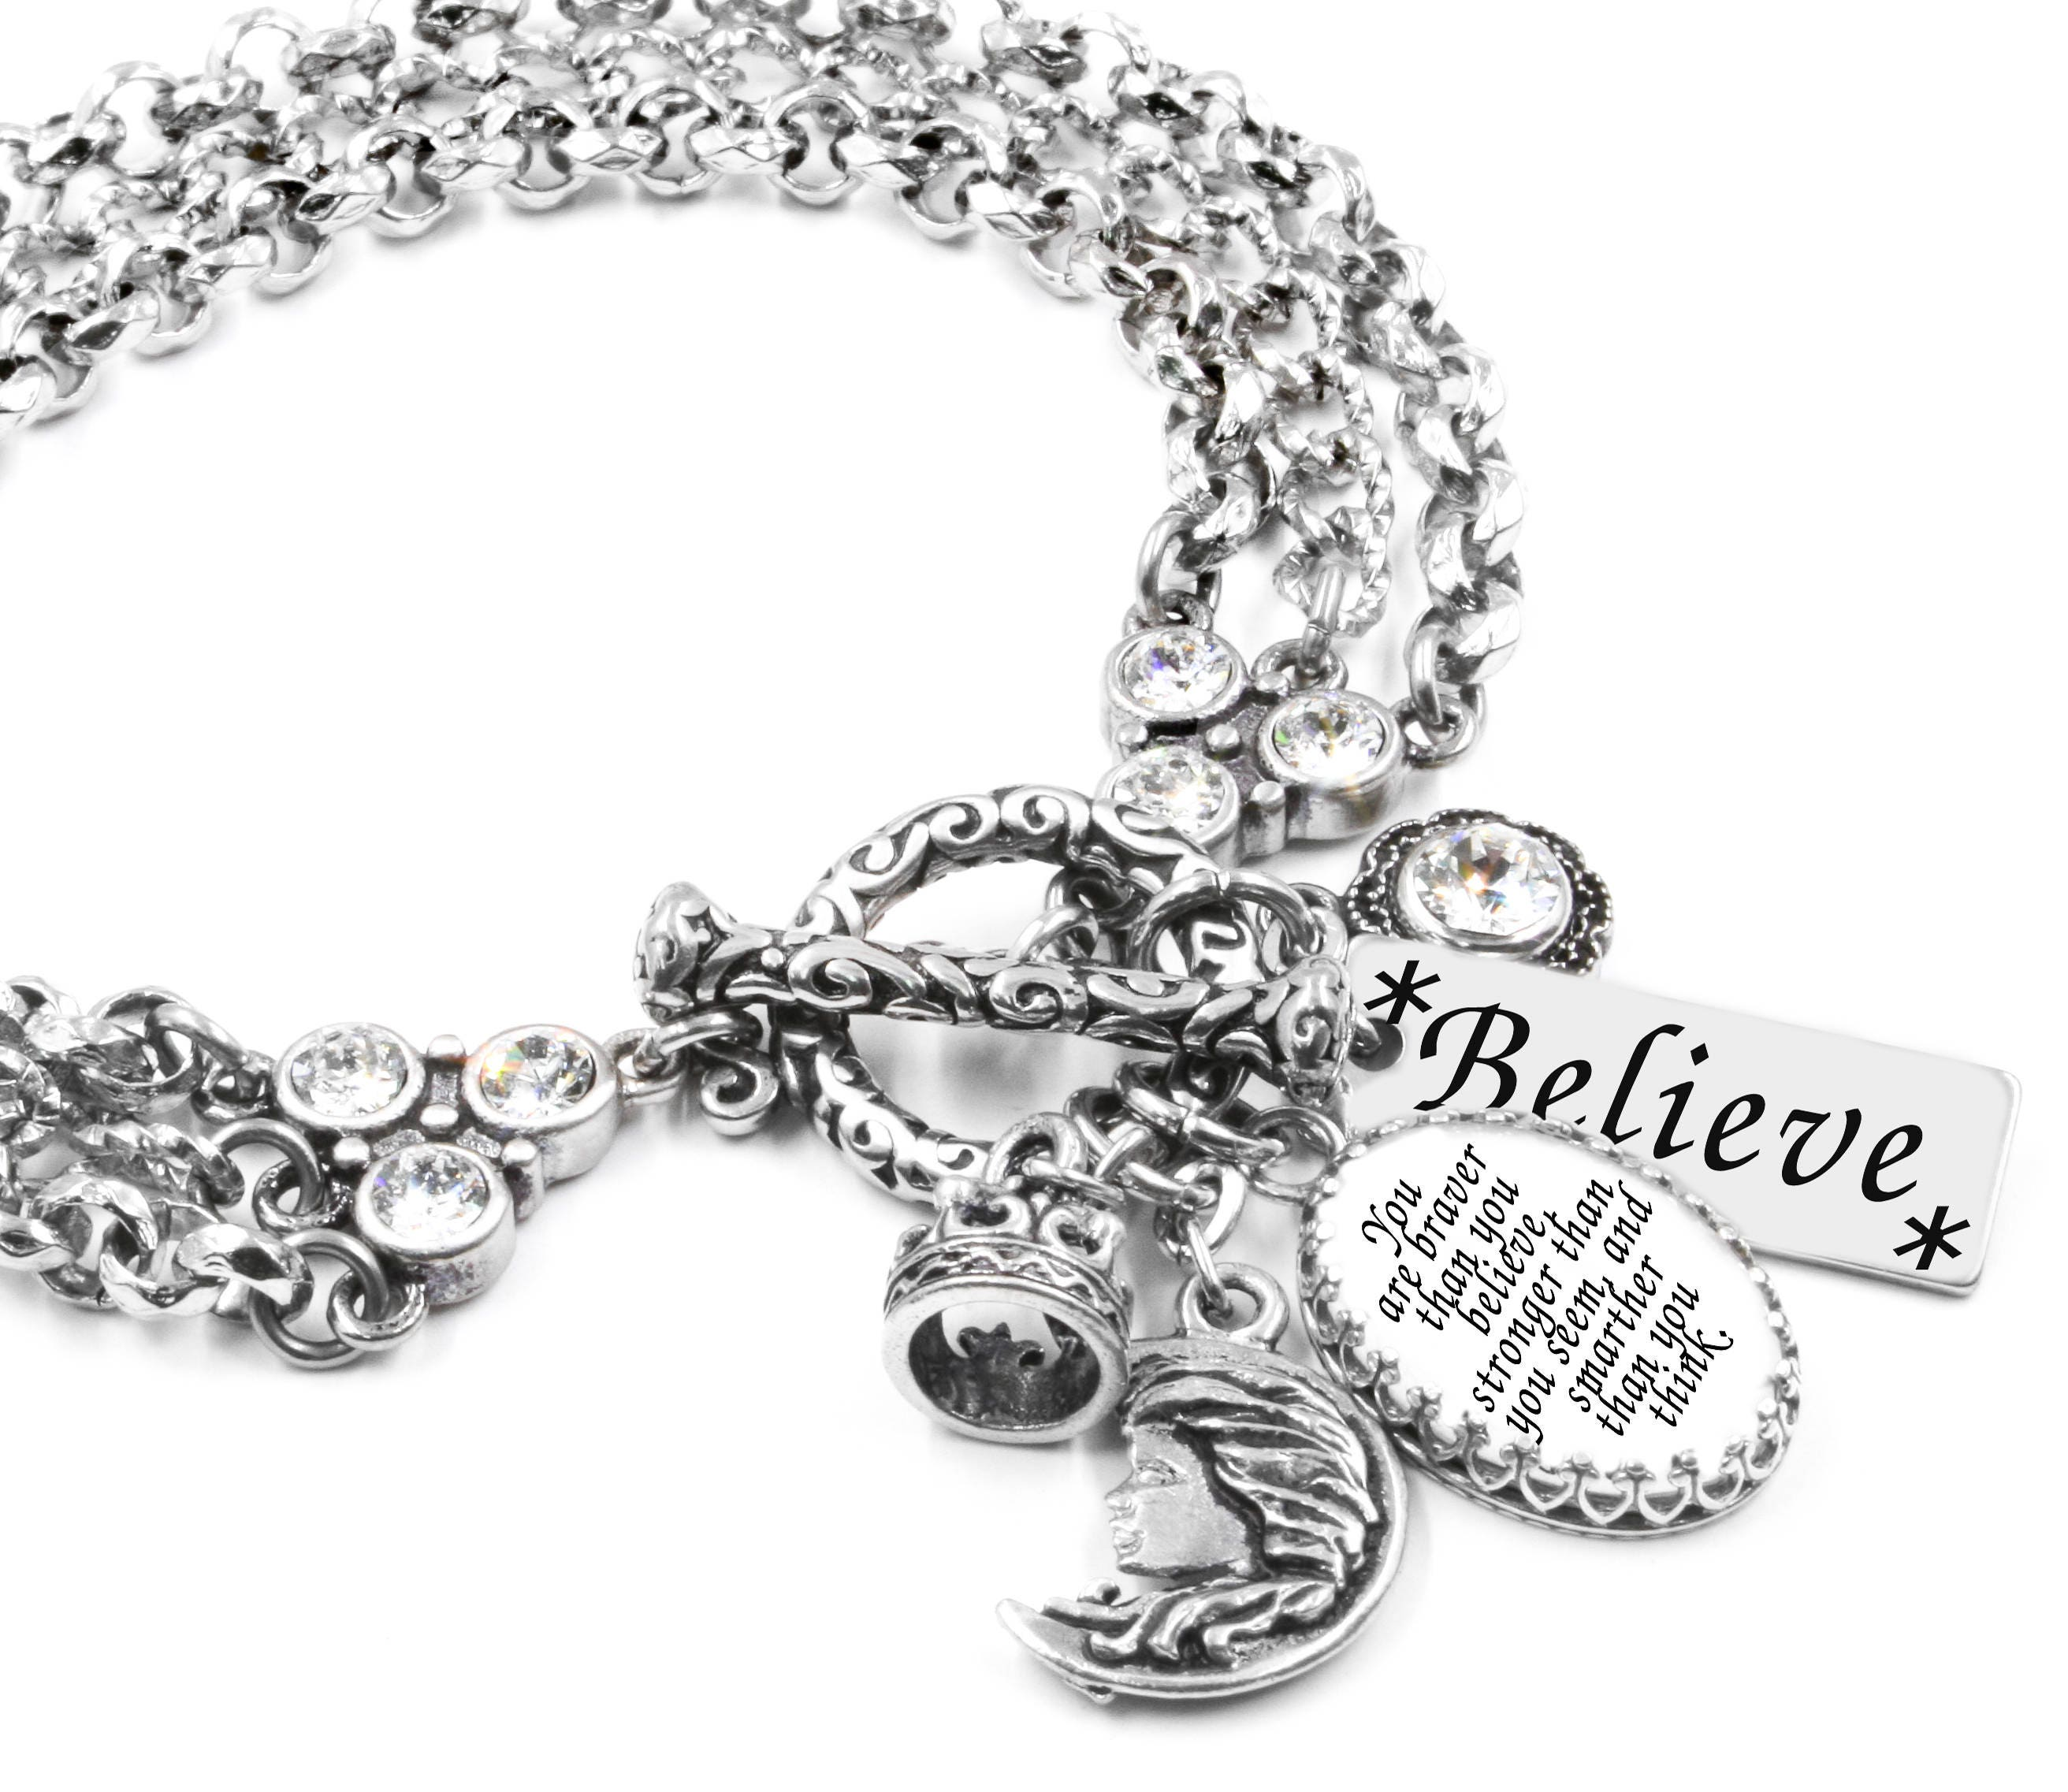 Inspirational Charm Bracelets: Quote Charm Bracelet Quote Bracelet Inspirational Bracelet